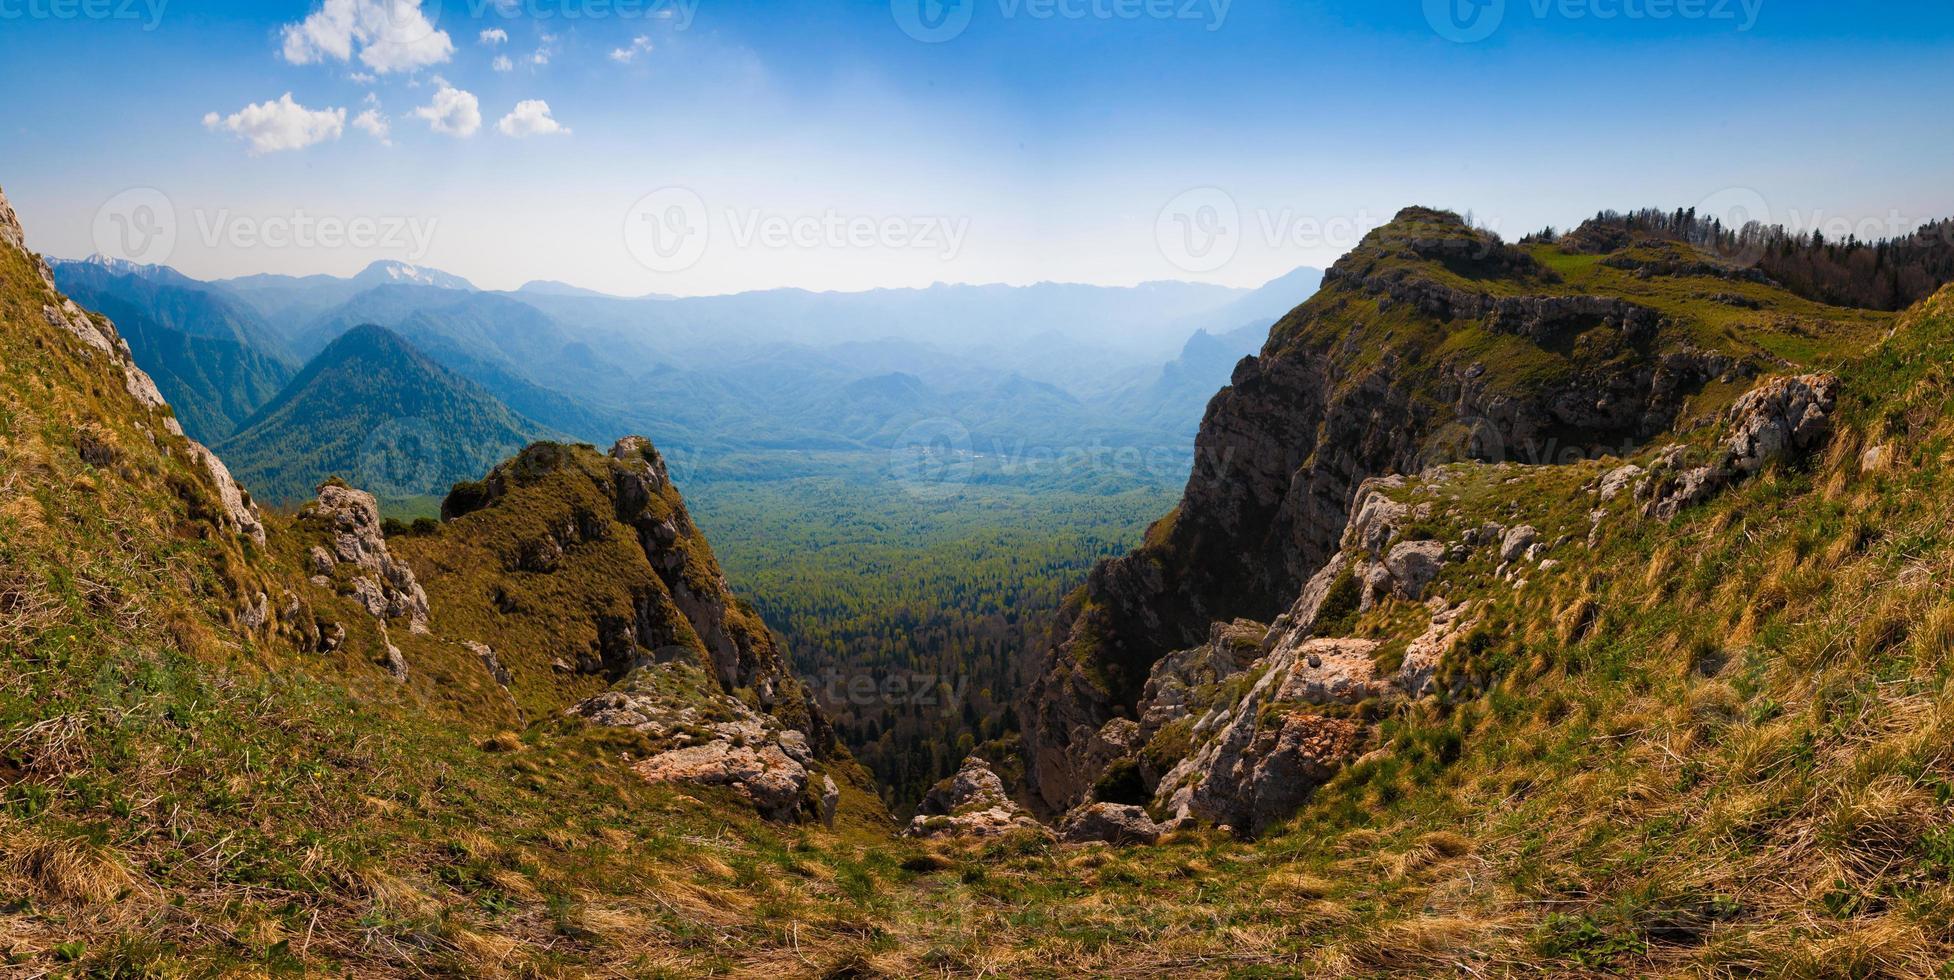 Mountain day summer photo